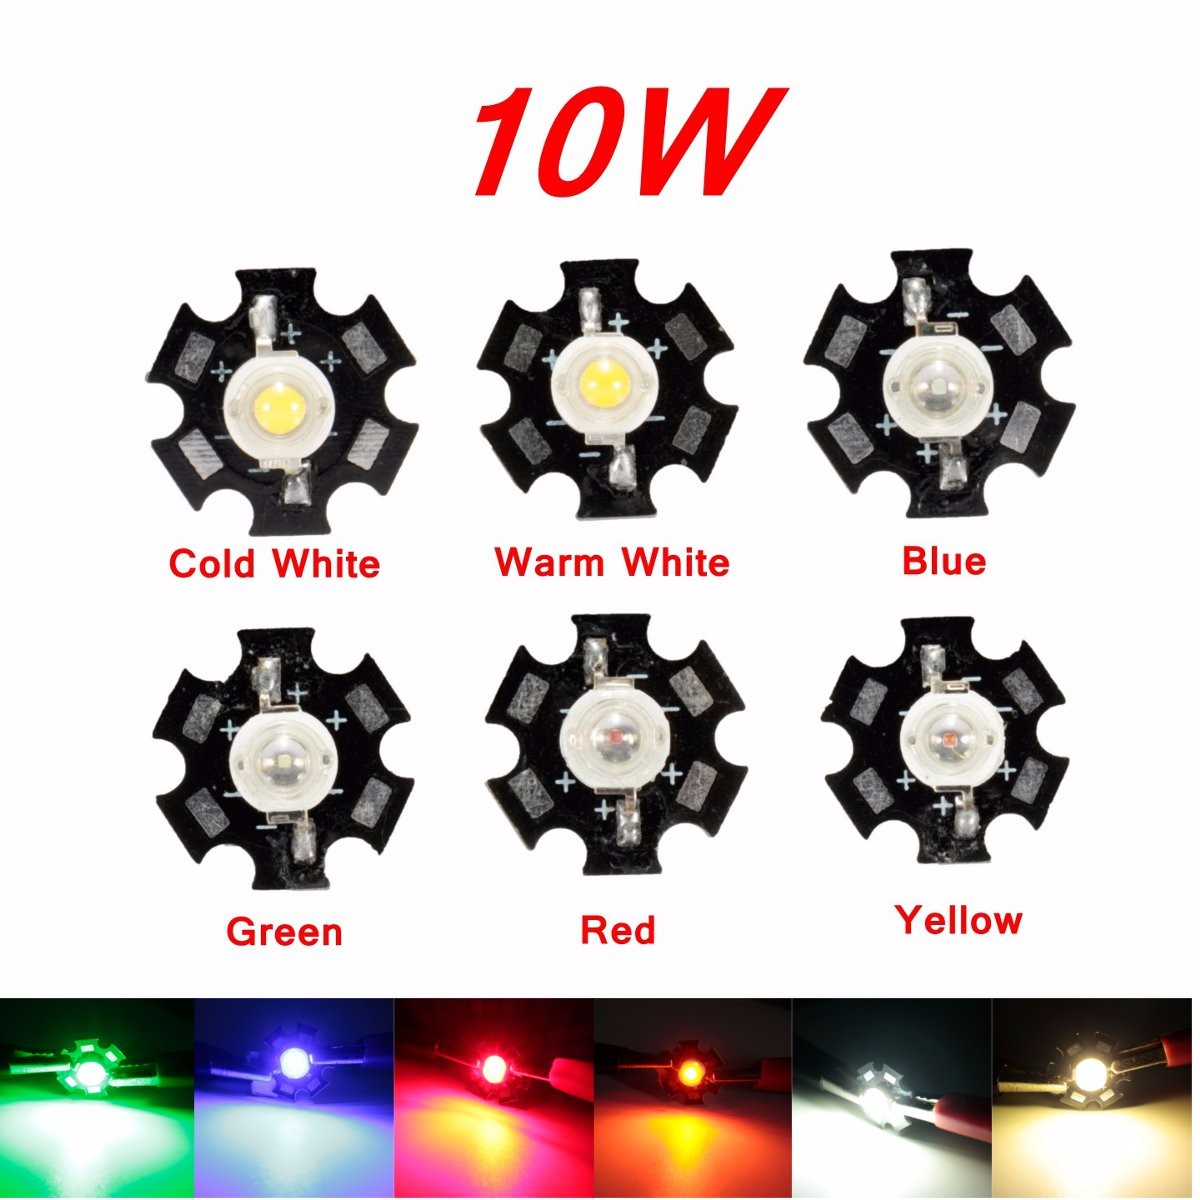 Genossenschaft High Power Led Pcb Licht Lampe Birne Perlen Chips Auto Innen Lesen Lampe Aquarium Kühlkörper